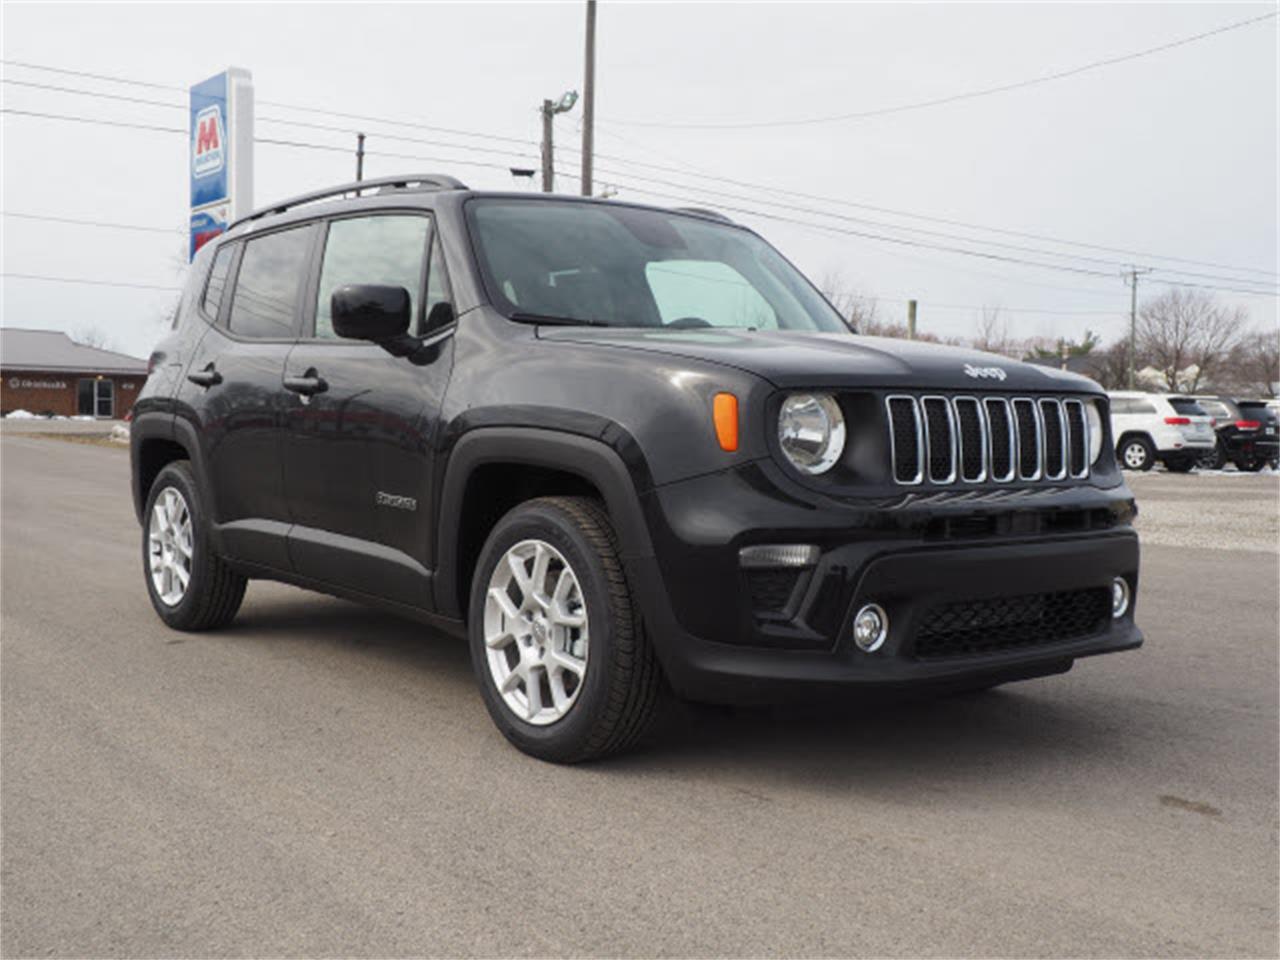 2020 Jeep Renegade (CC-1421446) for sale in Marysville, Ohio